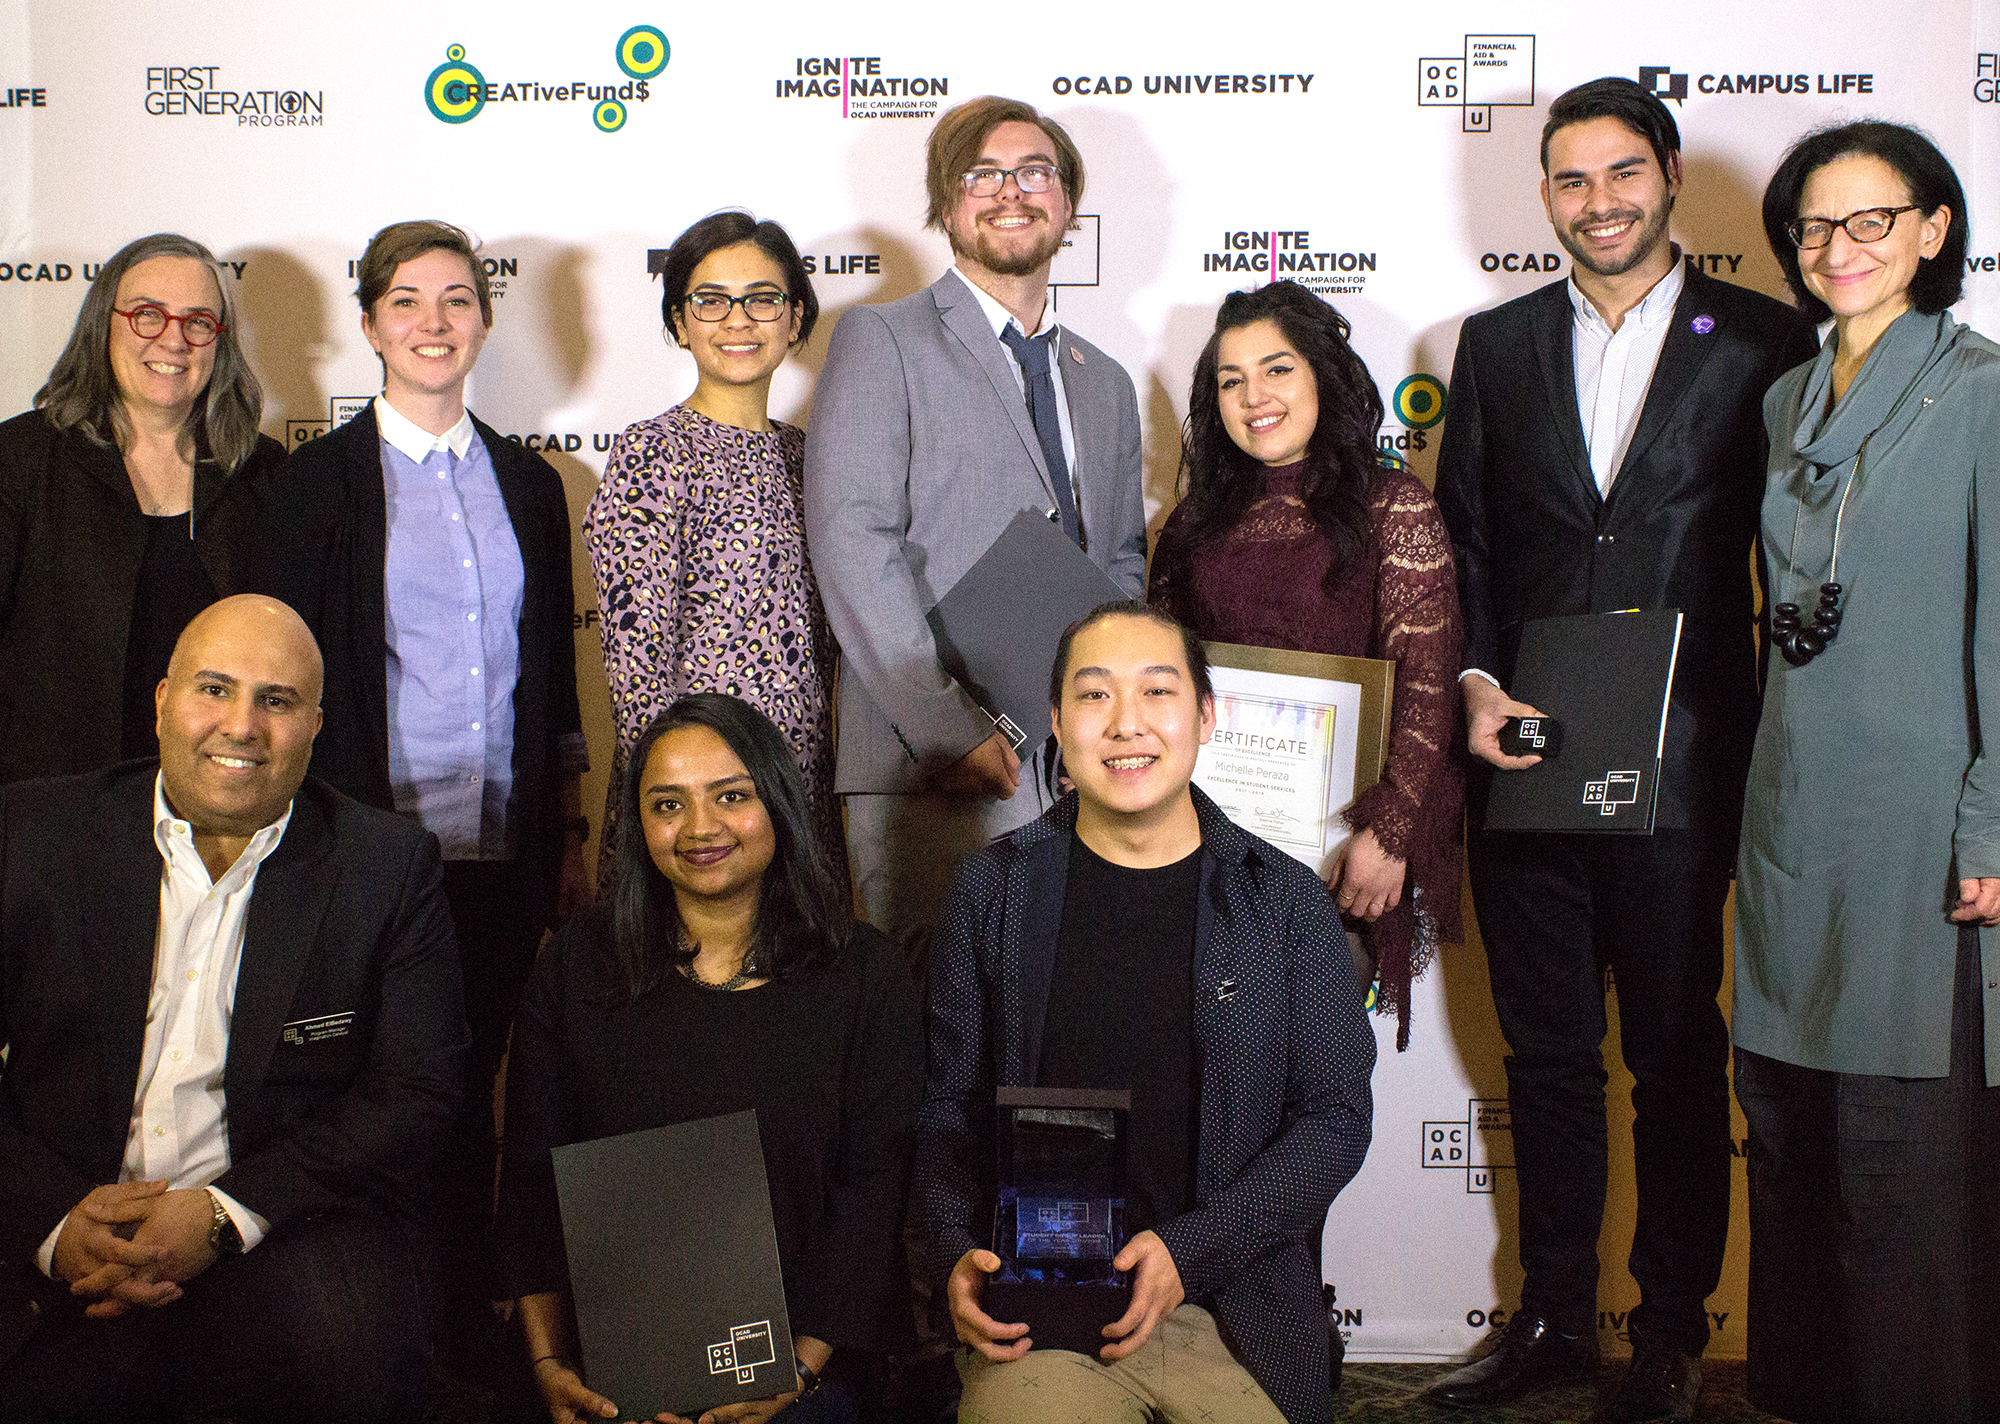 Group photo of student winners with OCAD U staff